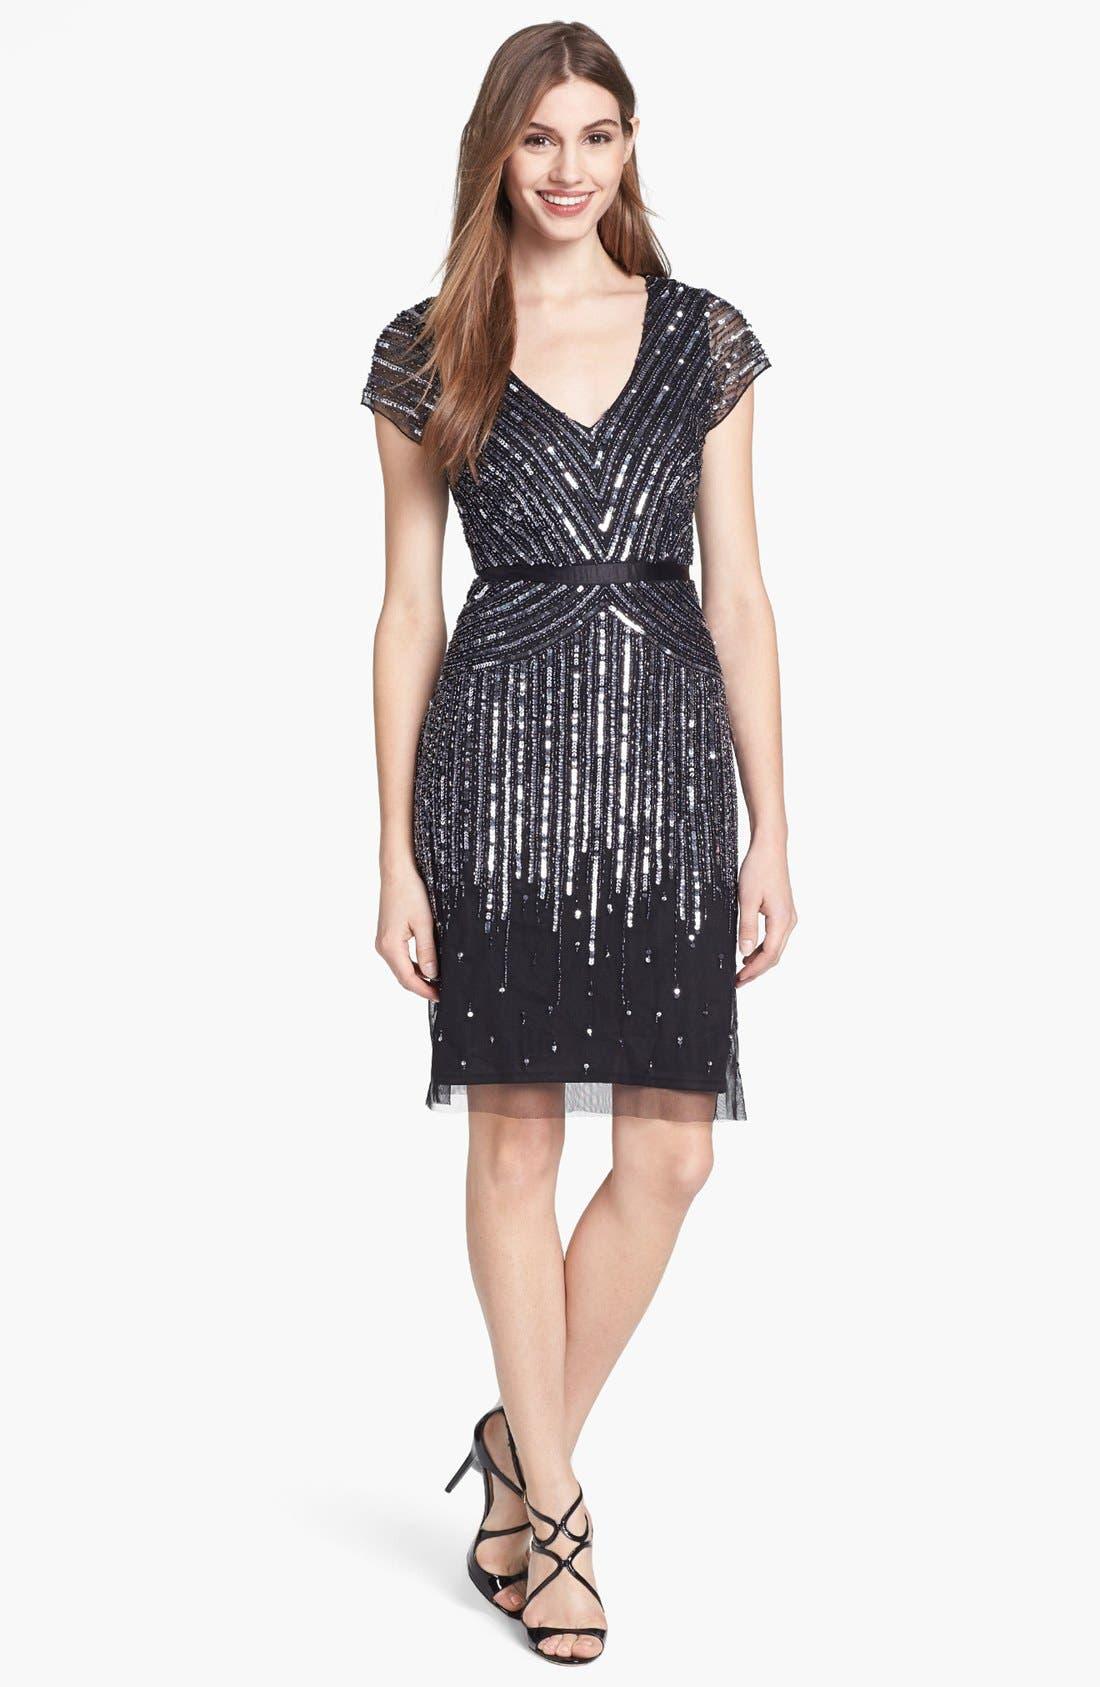 Alternate Image 1 Selected - Adrianna Papell Embellished Mesh Dress (Regular & Petite)